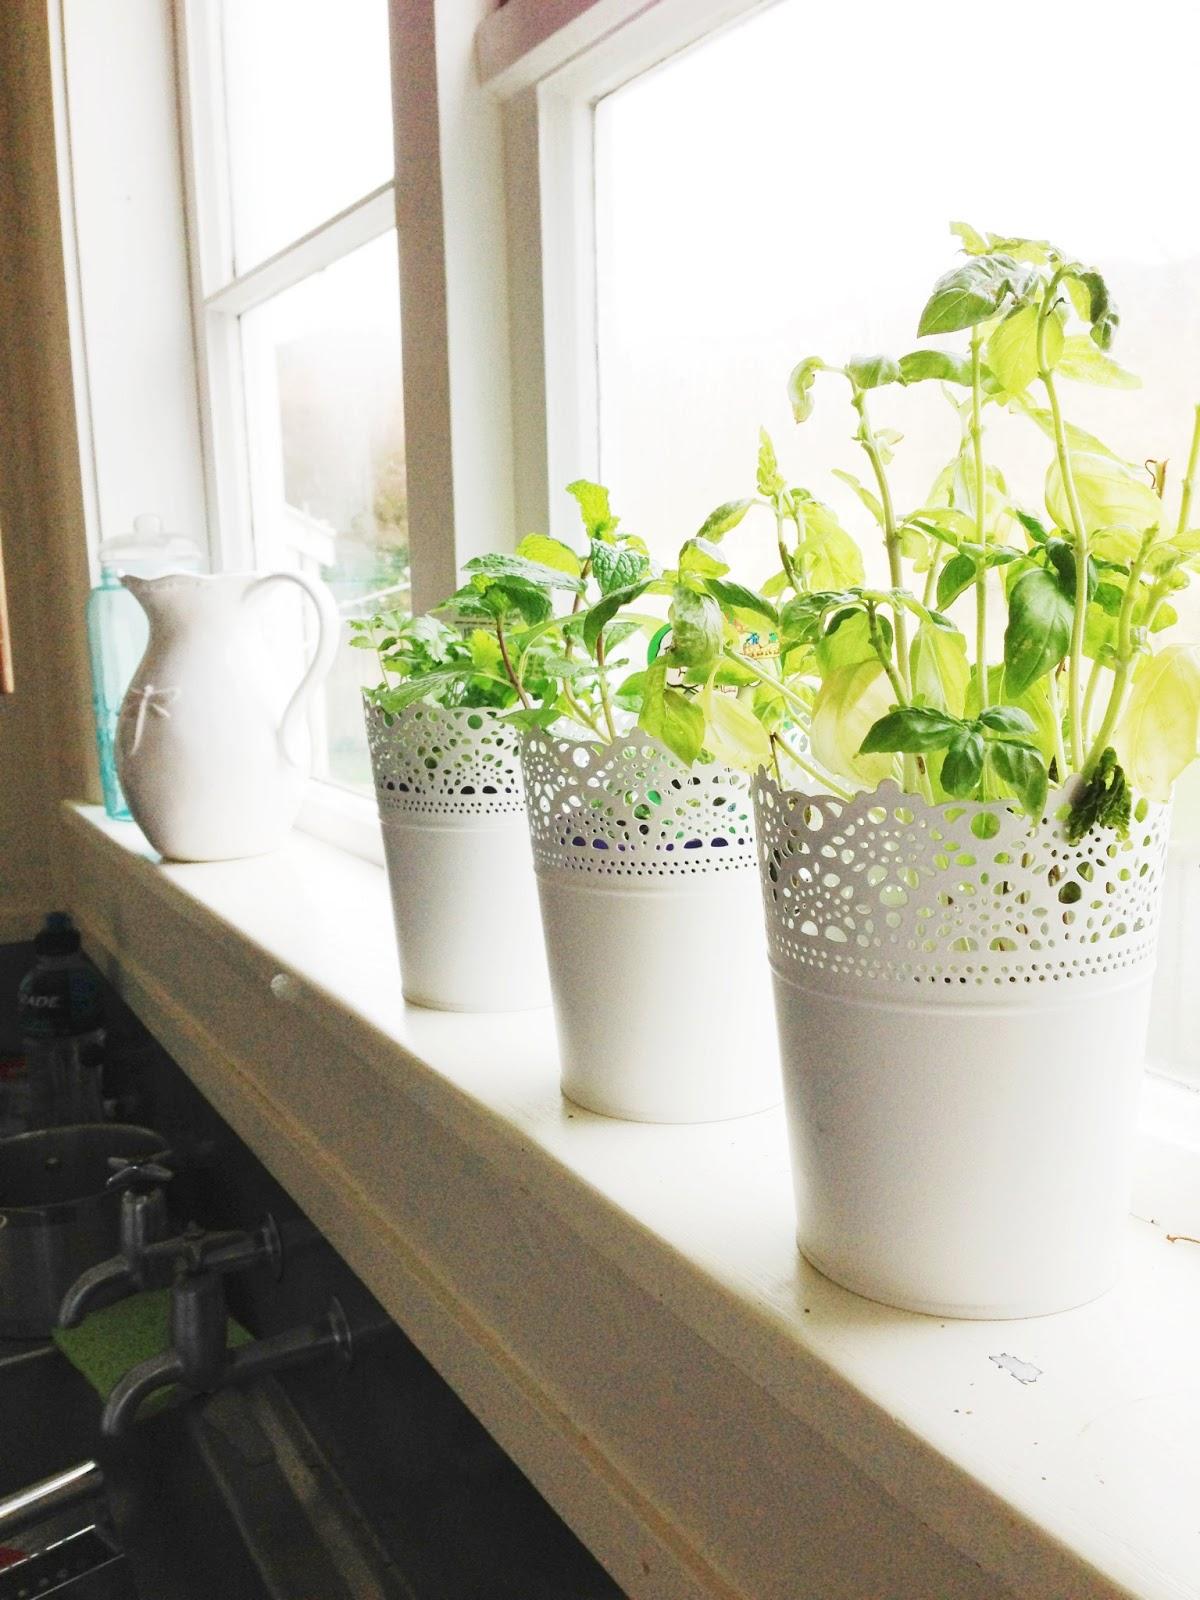 Herb pots for kitchen - Herb Pots